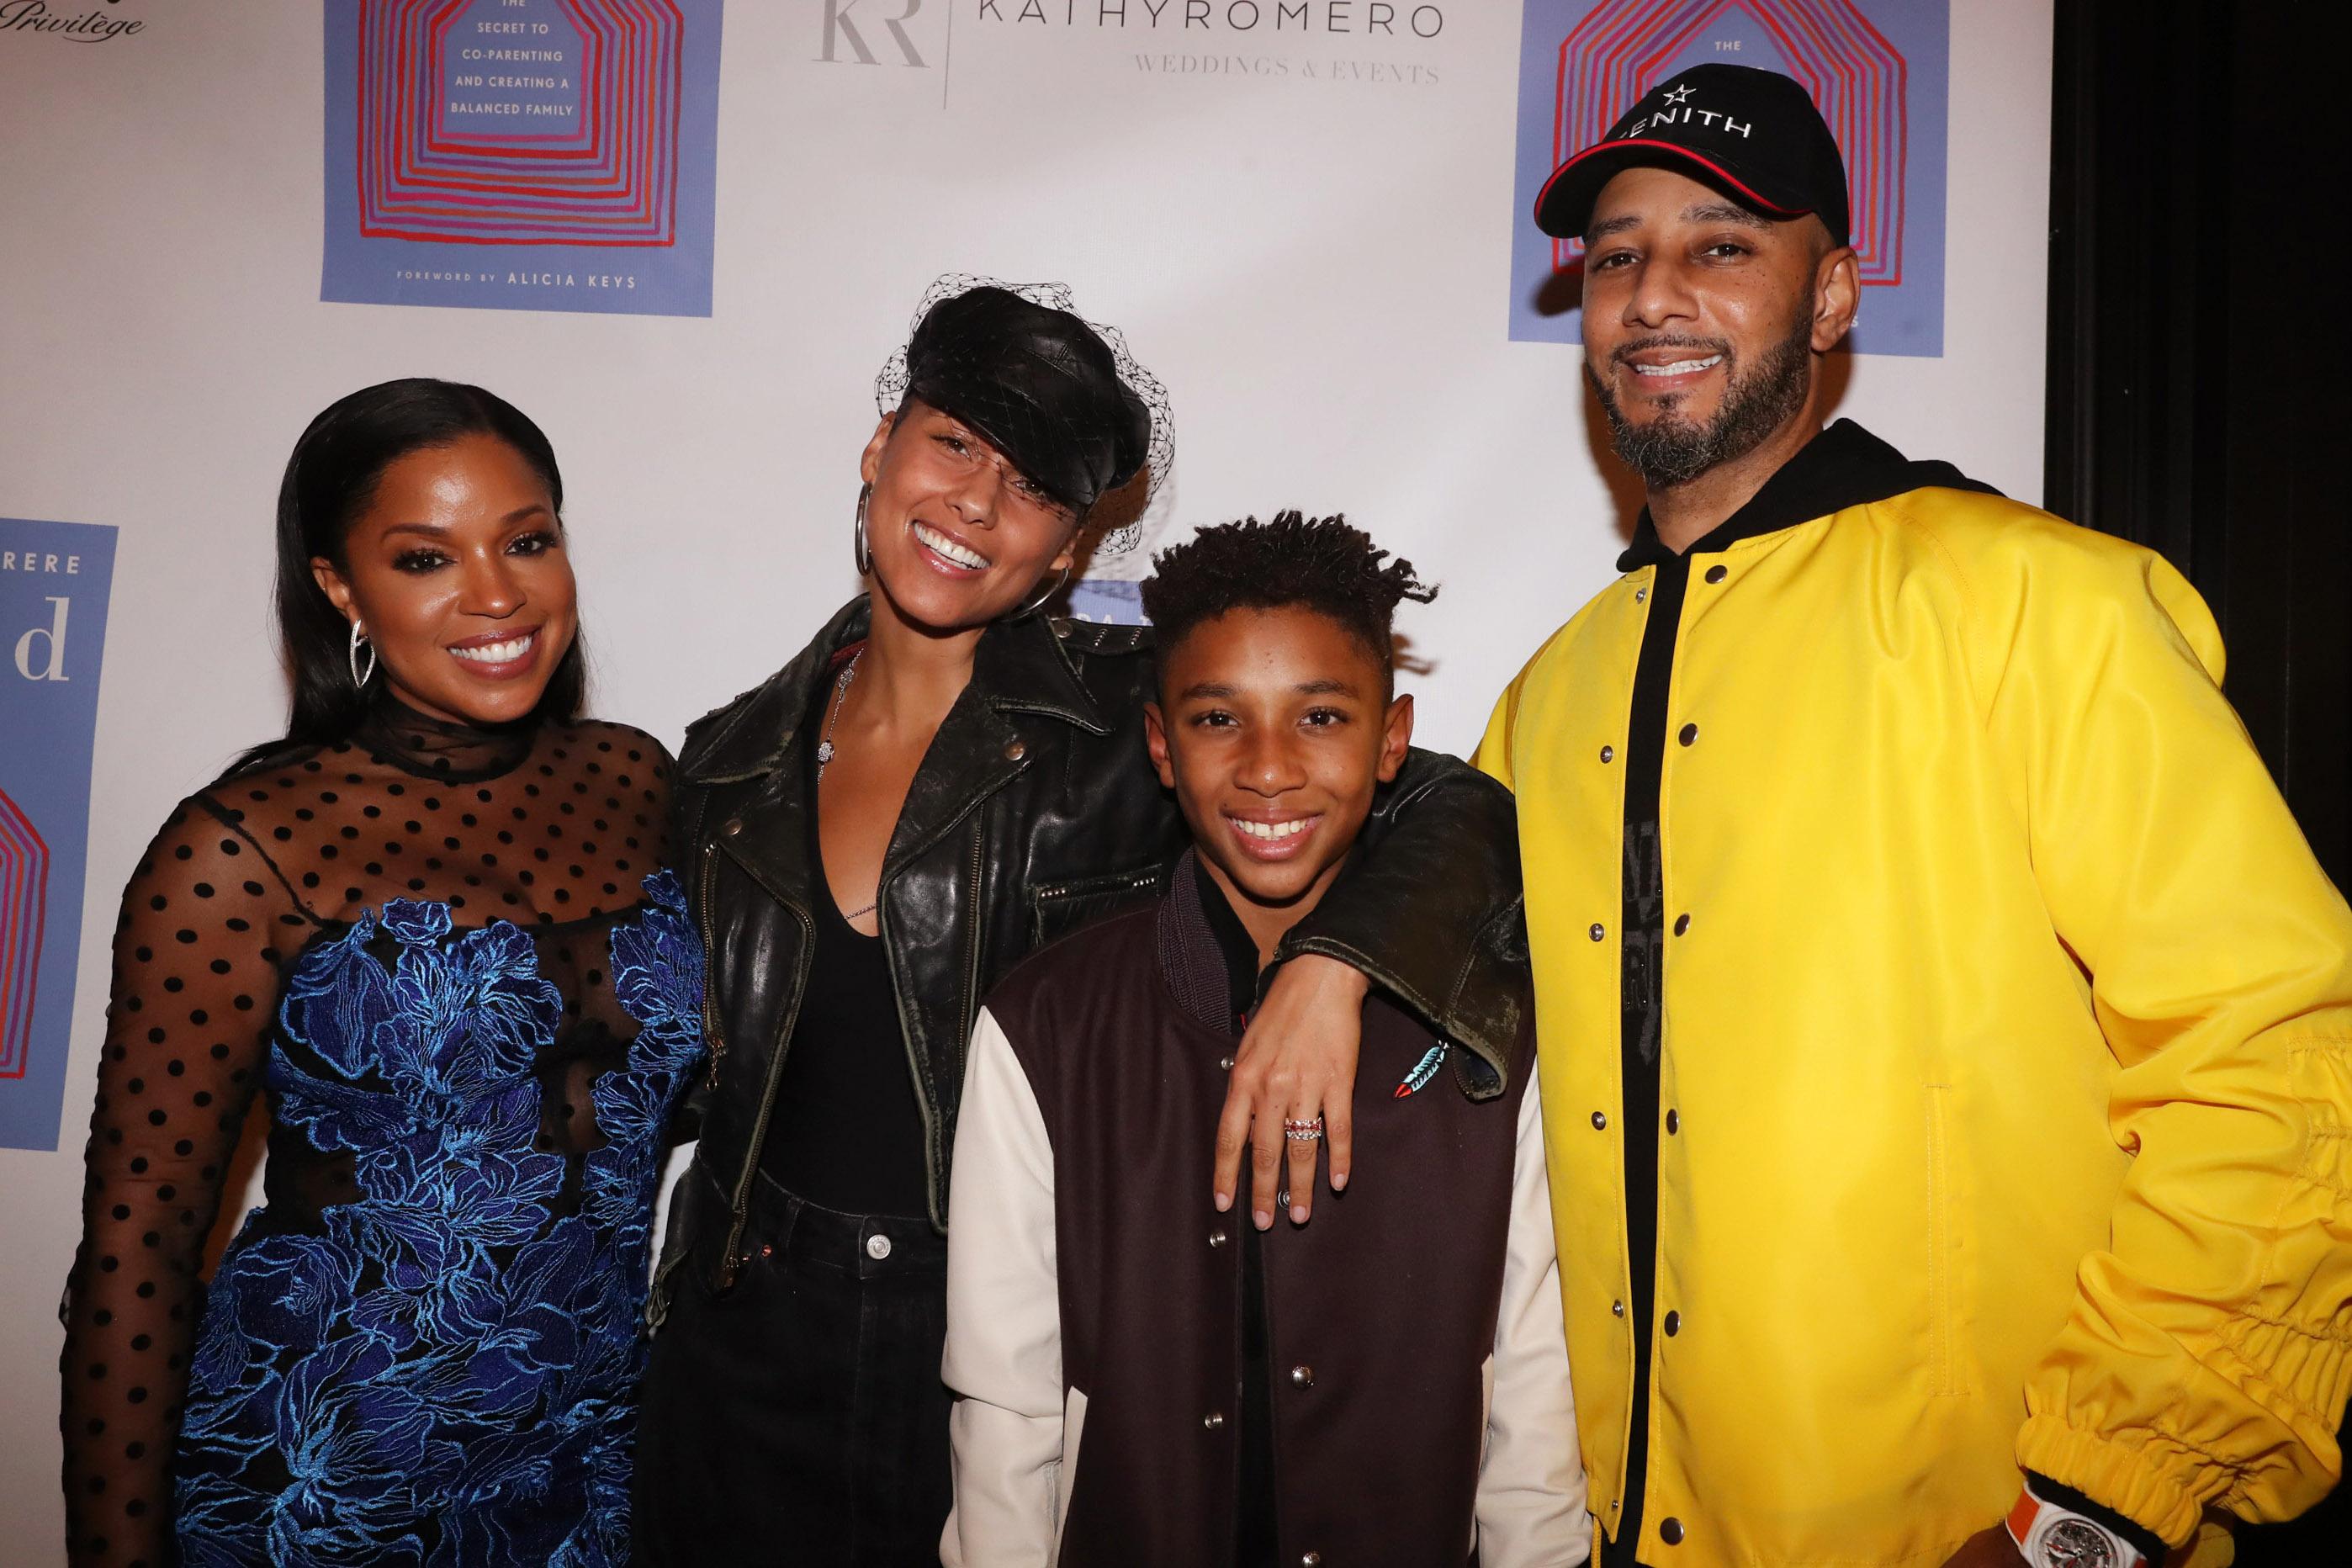 Alicia Keys Swizz Beatz And Mashonda Tifrere Prove Blended Families Can Work